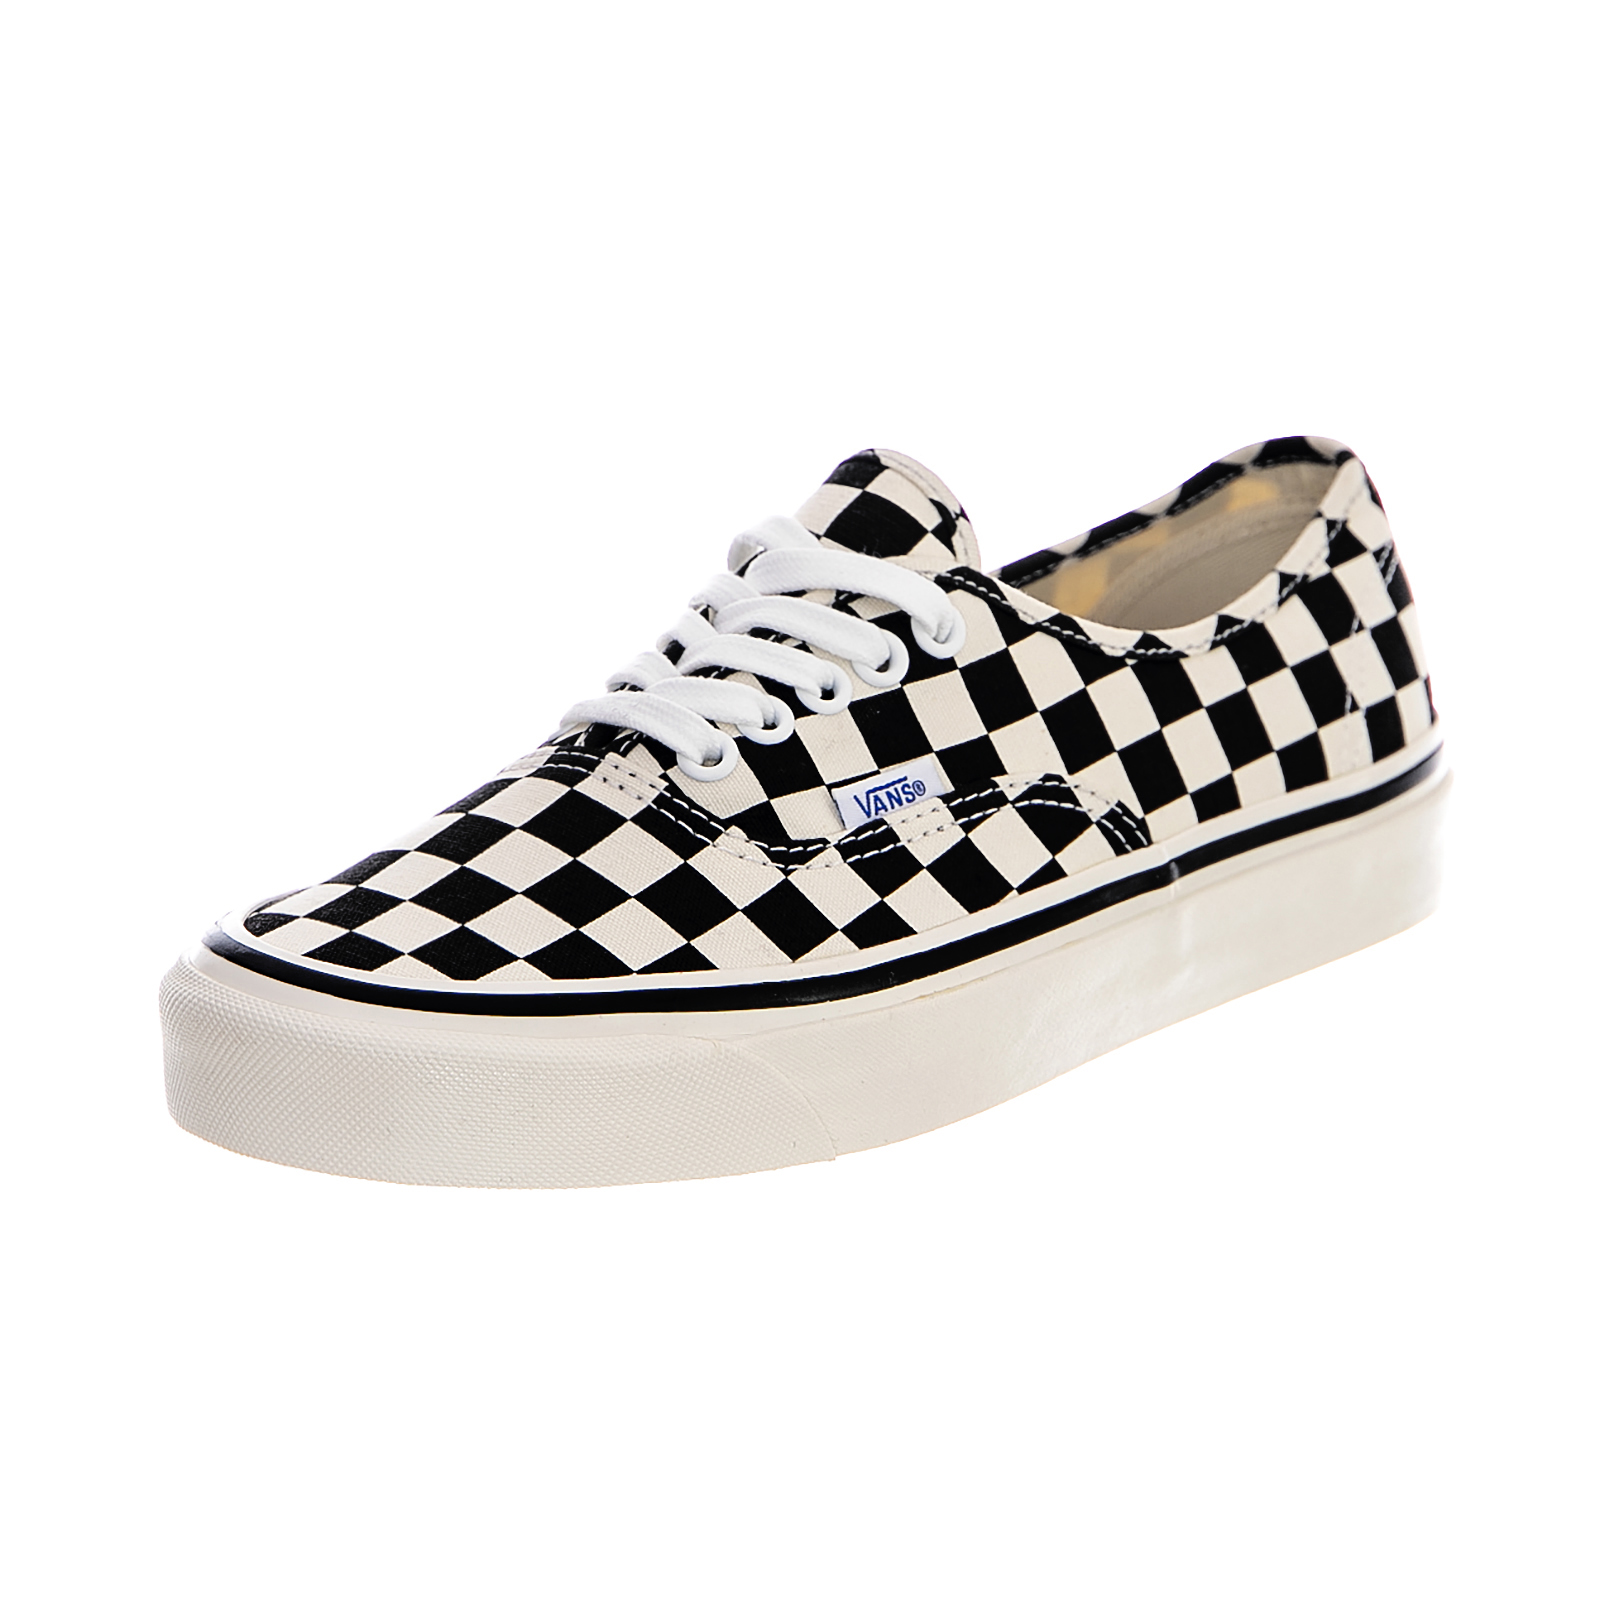 Vans Ua Authentic Checkerboard